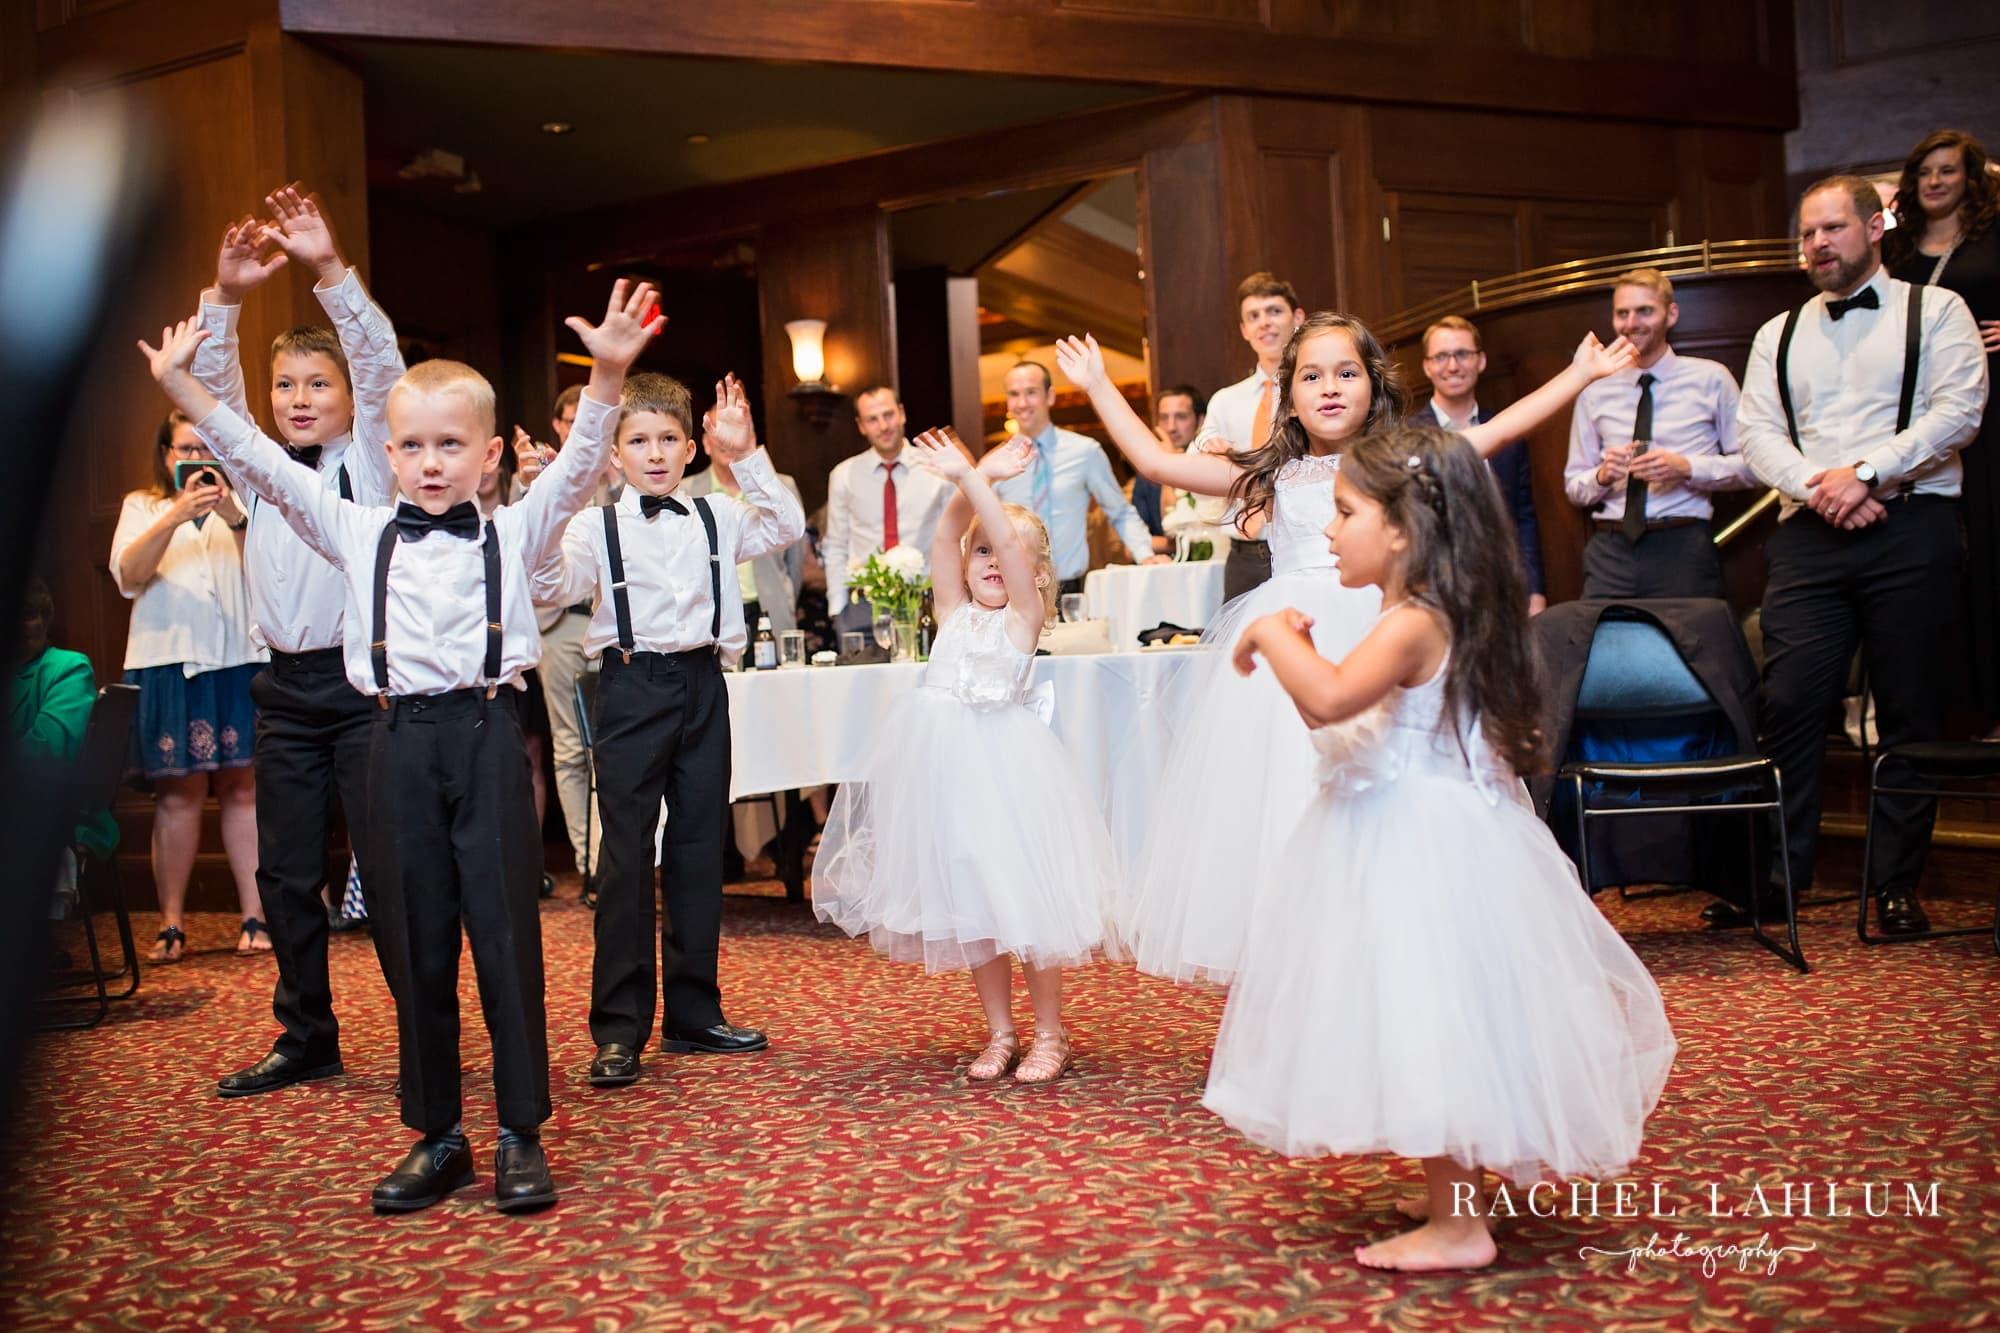 Kids dance at the Metropolitan Club & Ballroom in Golden Valley, Minnesota.